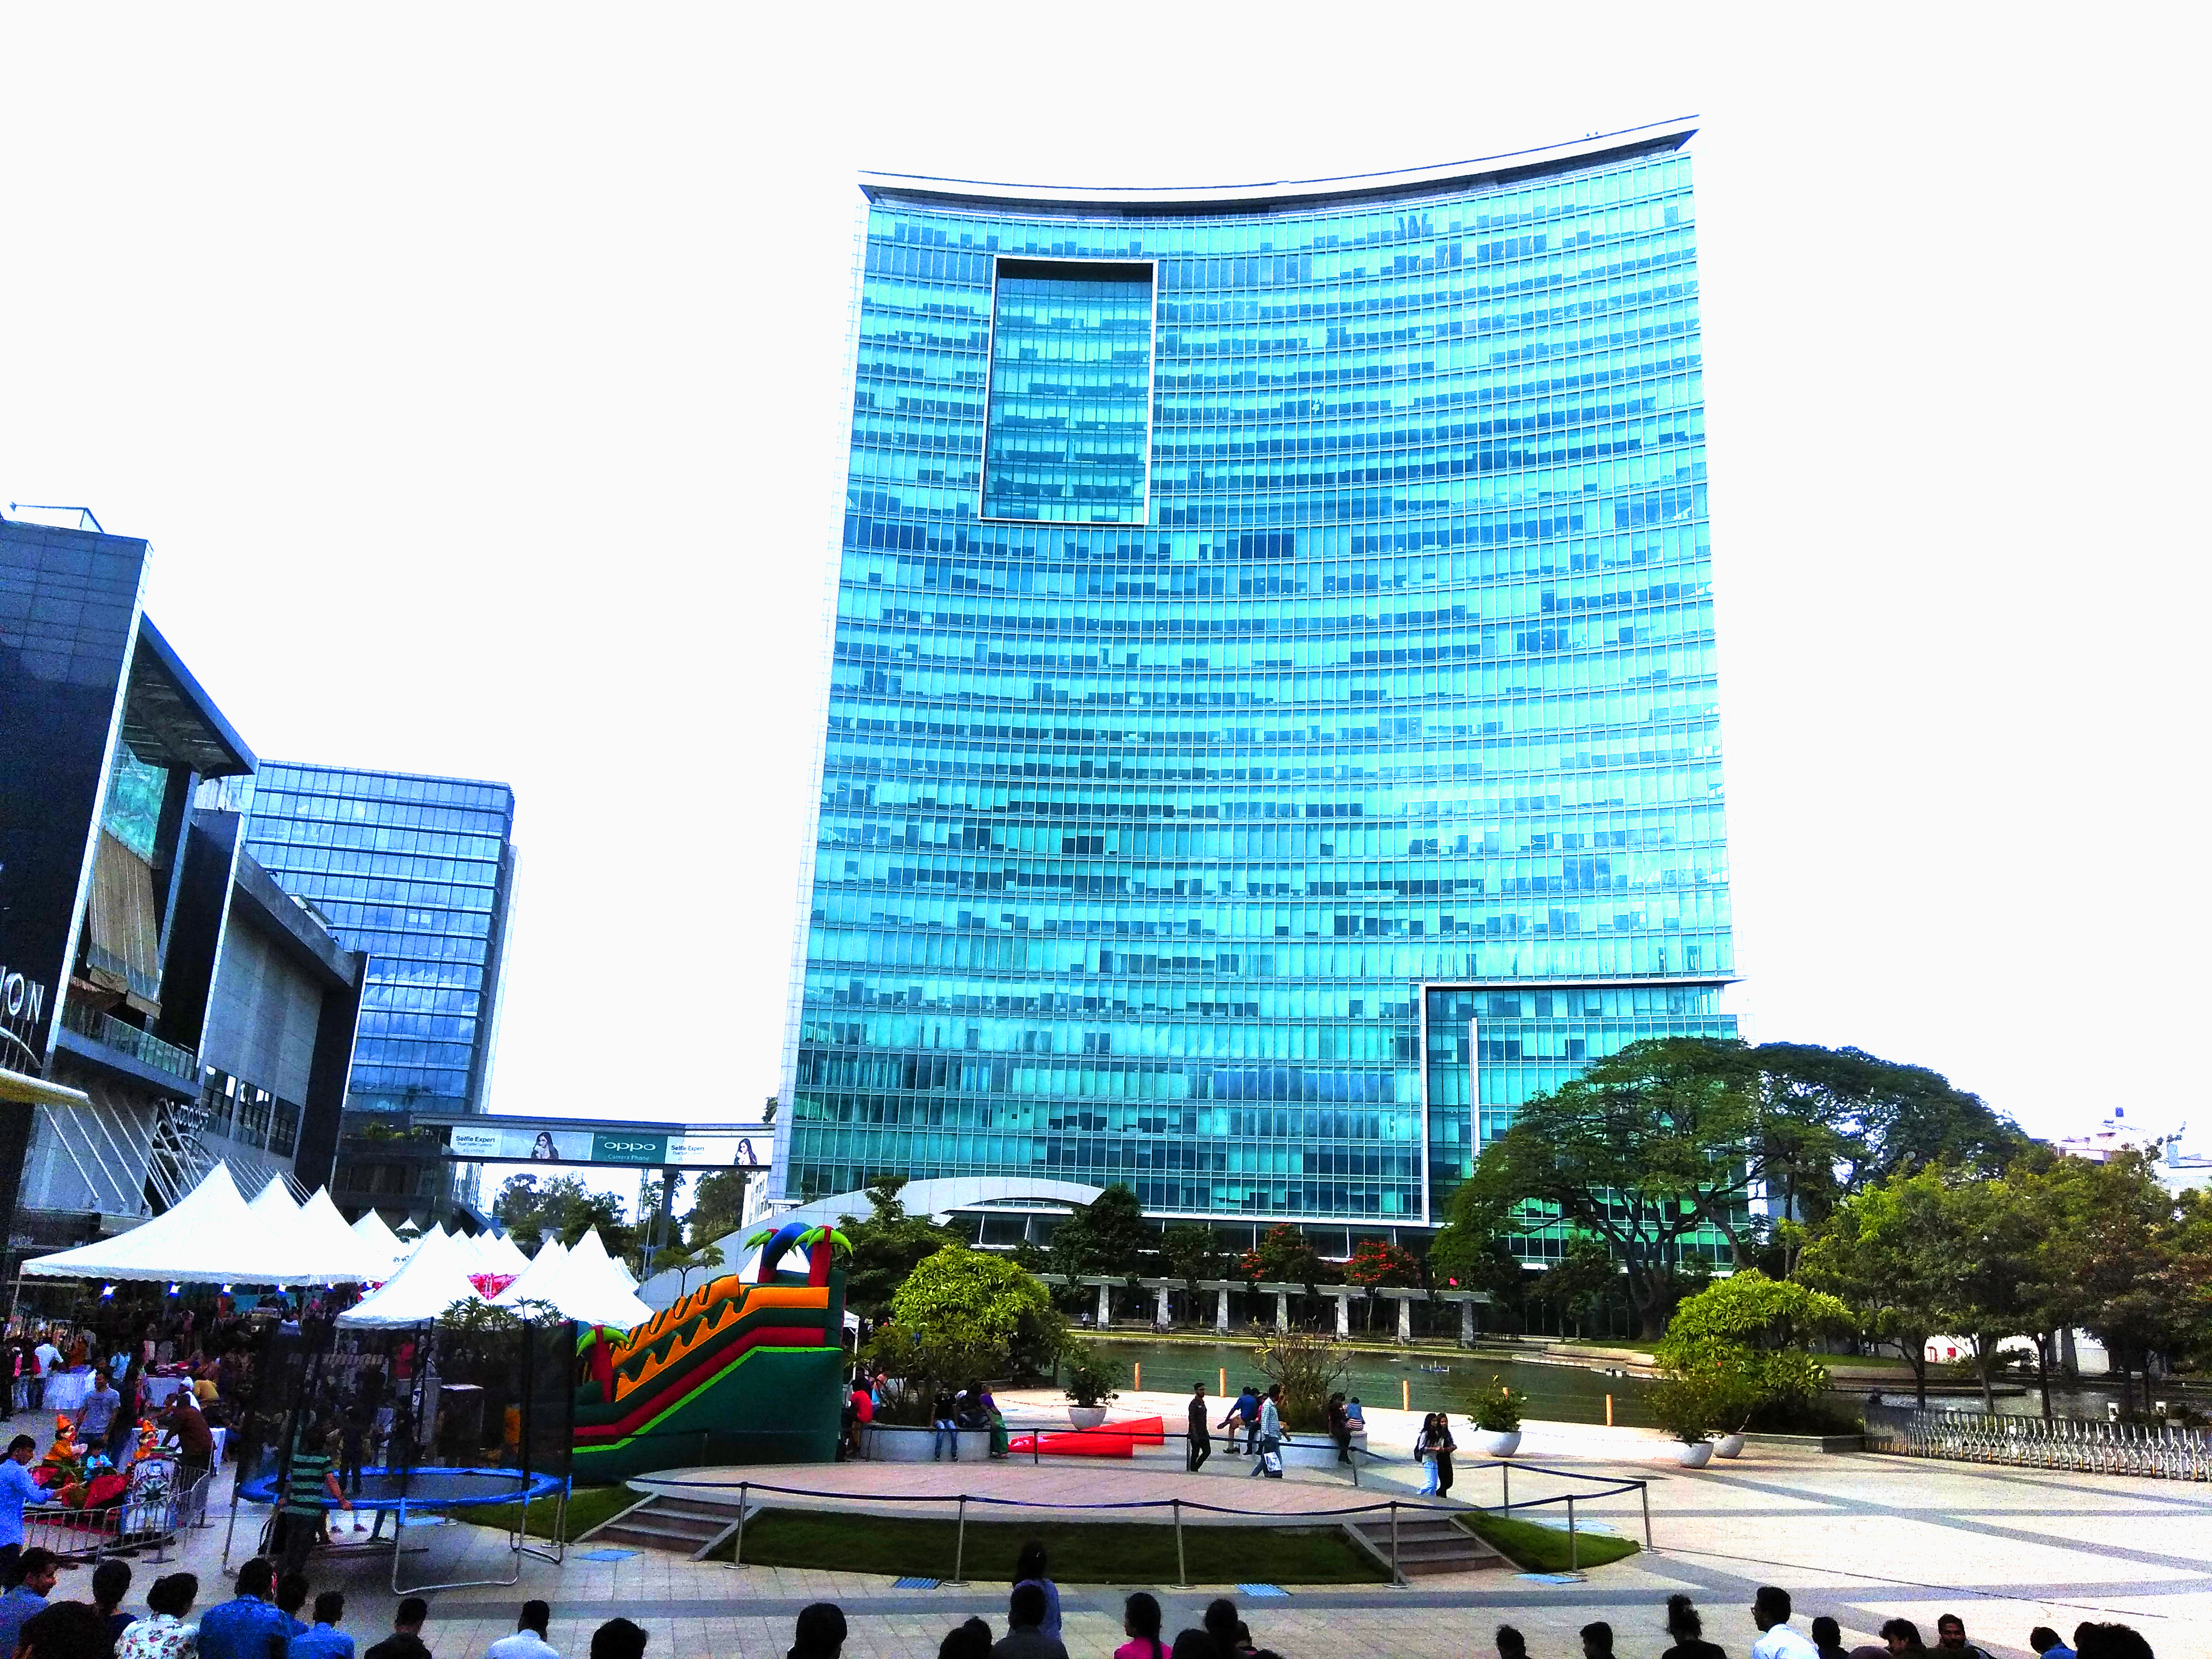 World_Trade_Center_Banglore - Amazing Architecture Near Bangalore